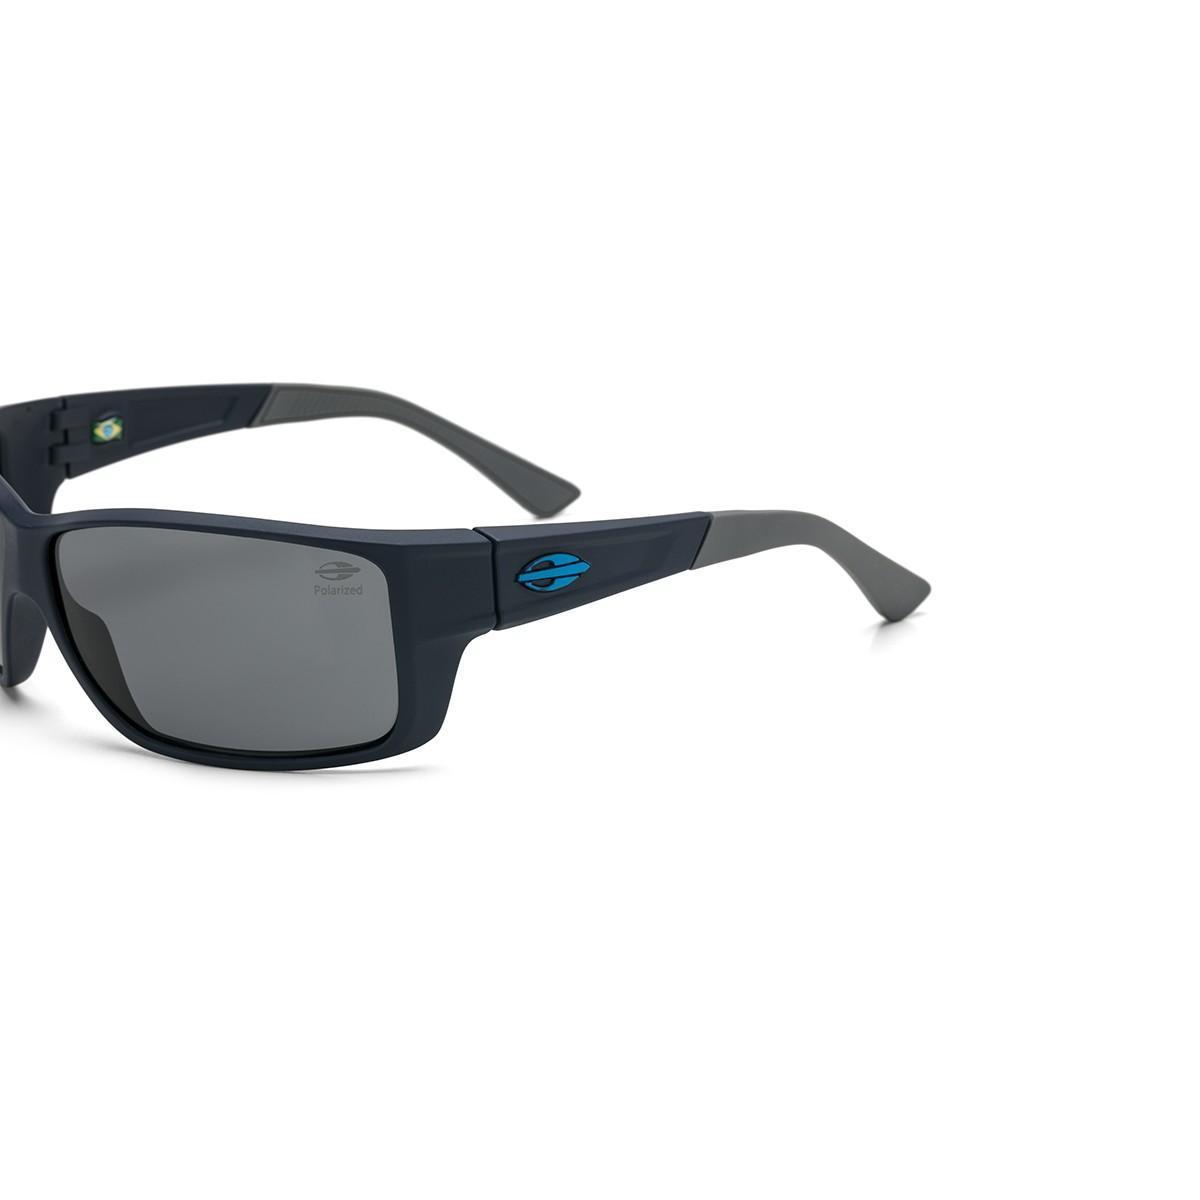 d411bb3dc Oculos Sol Infantil Mormaii Joaca Iii Nxt Azul Escuro Fechado Fosco L Cinz  - Pa R$ 229,00 à vista. Adicionar à sacola